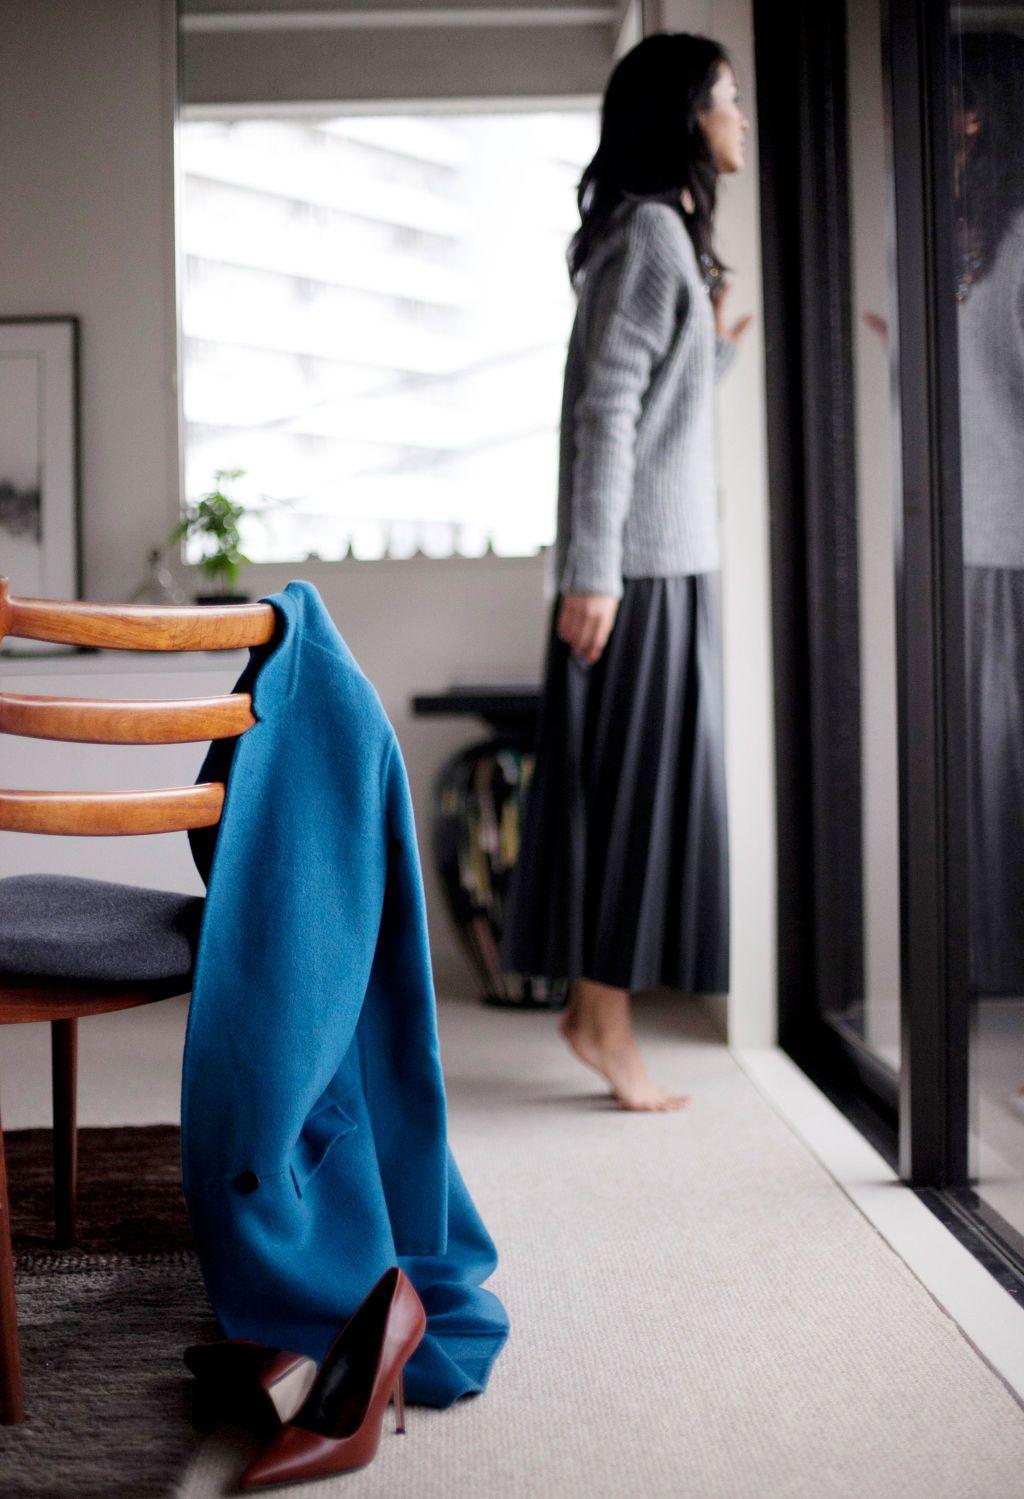 Image 1 of Yoshiko Kris-Webb 2 from Zara